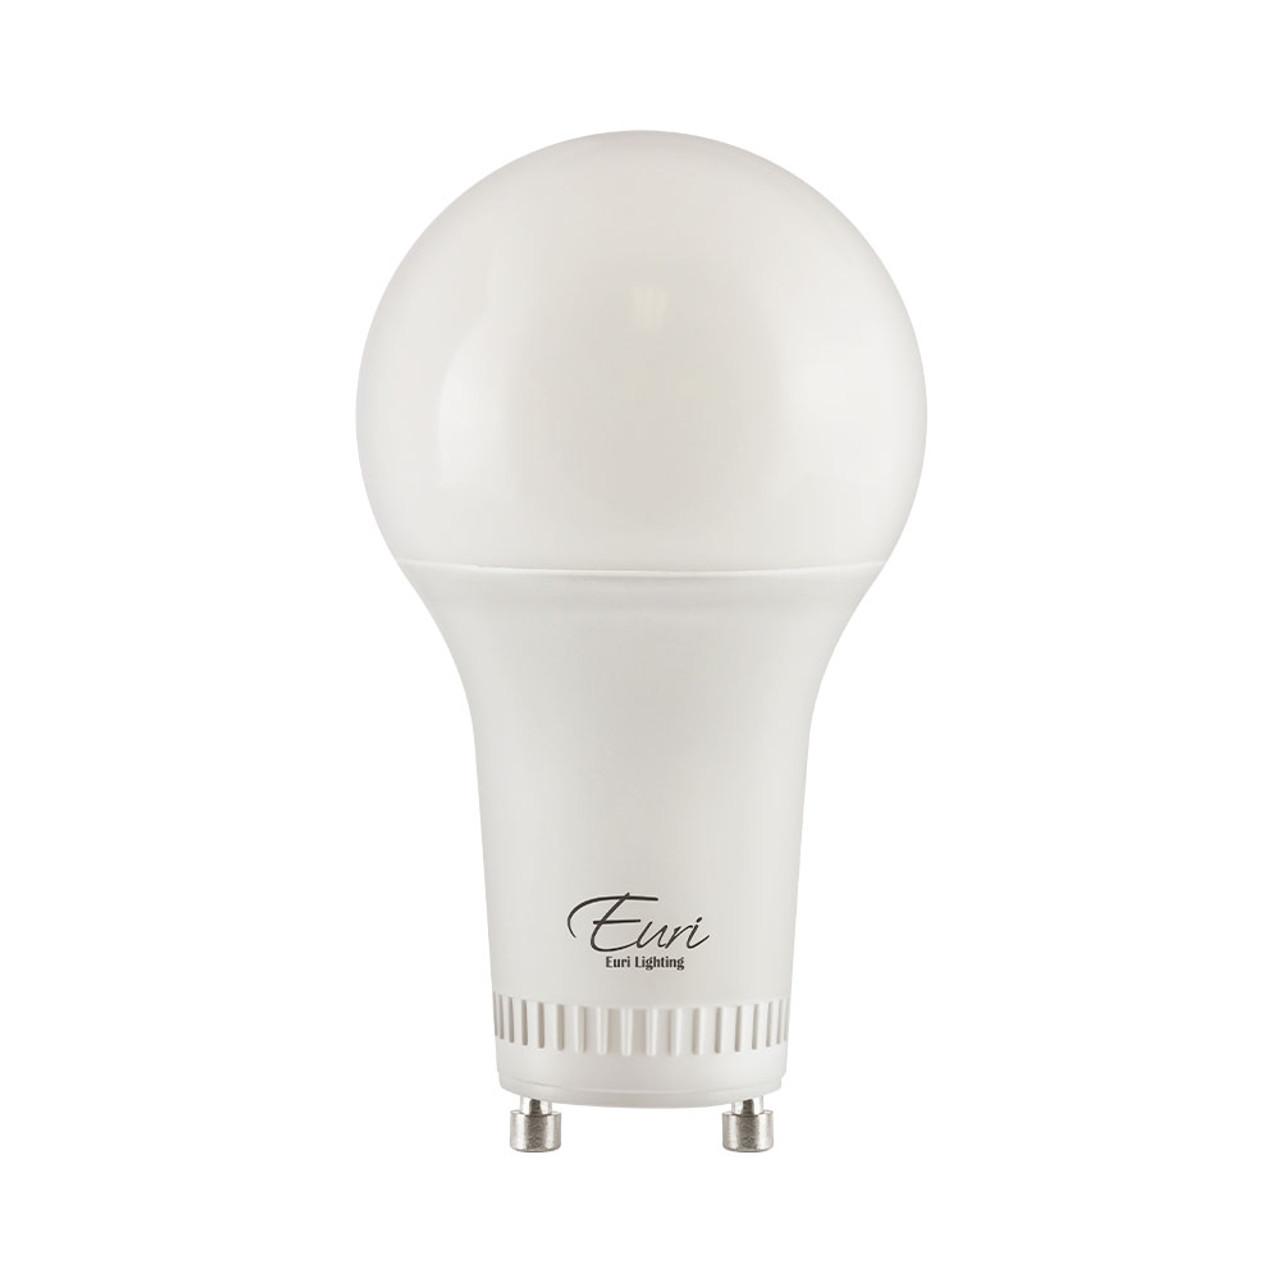 A19, Omni-Directional, LED Light Bulb, 14W, 120-277V, 1600l m, 5000K, GU24 Base (EA19-14W1150eGV)